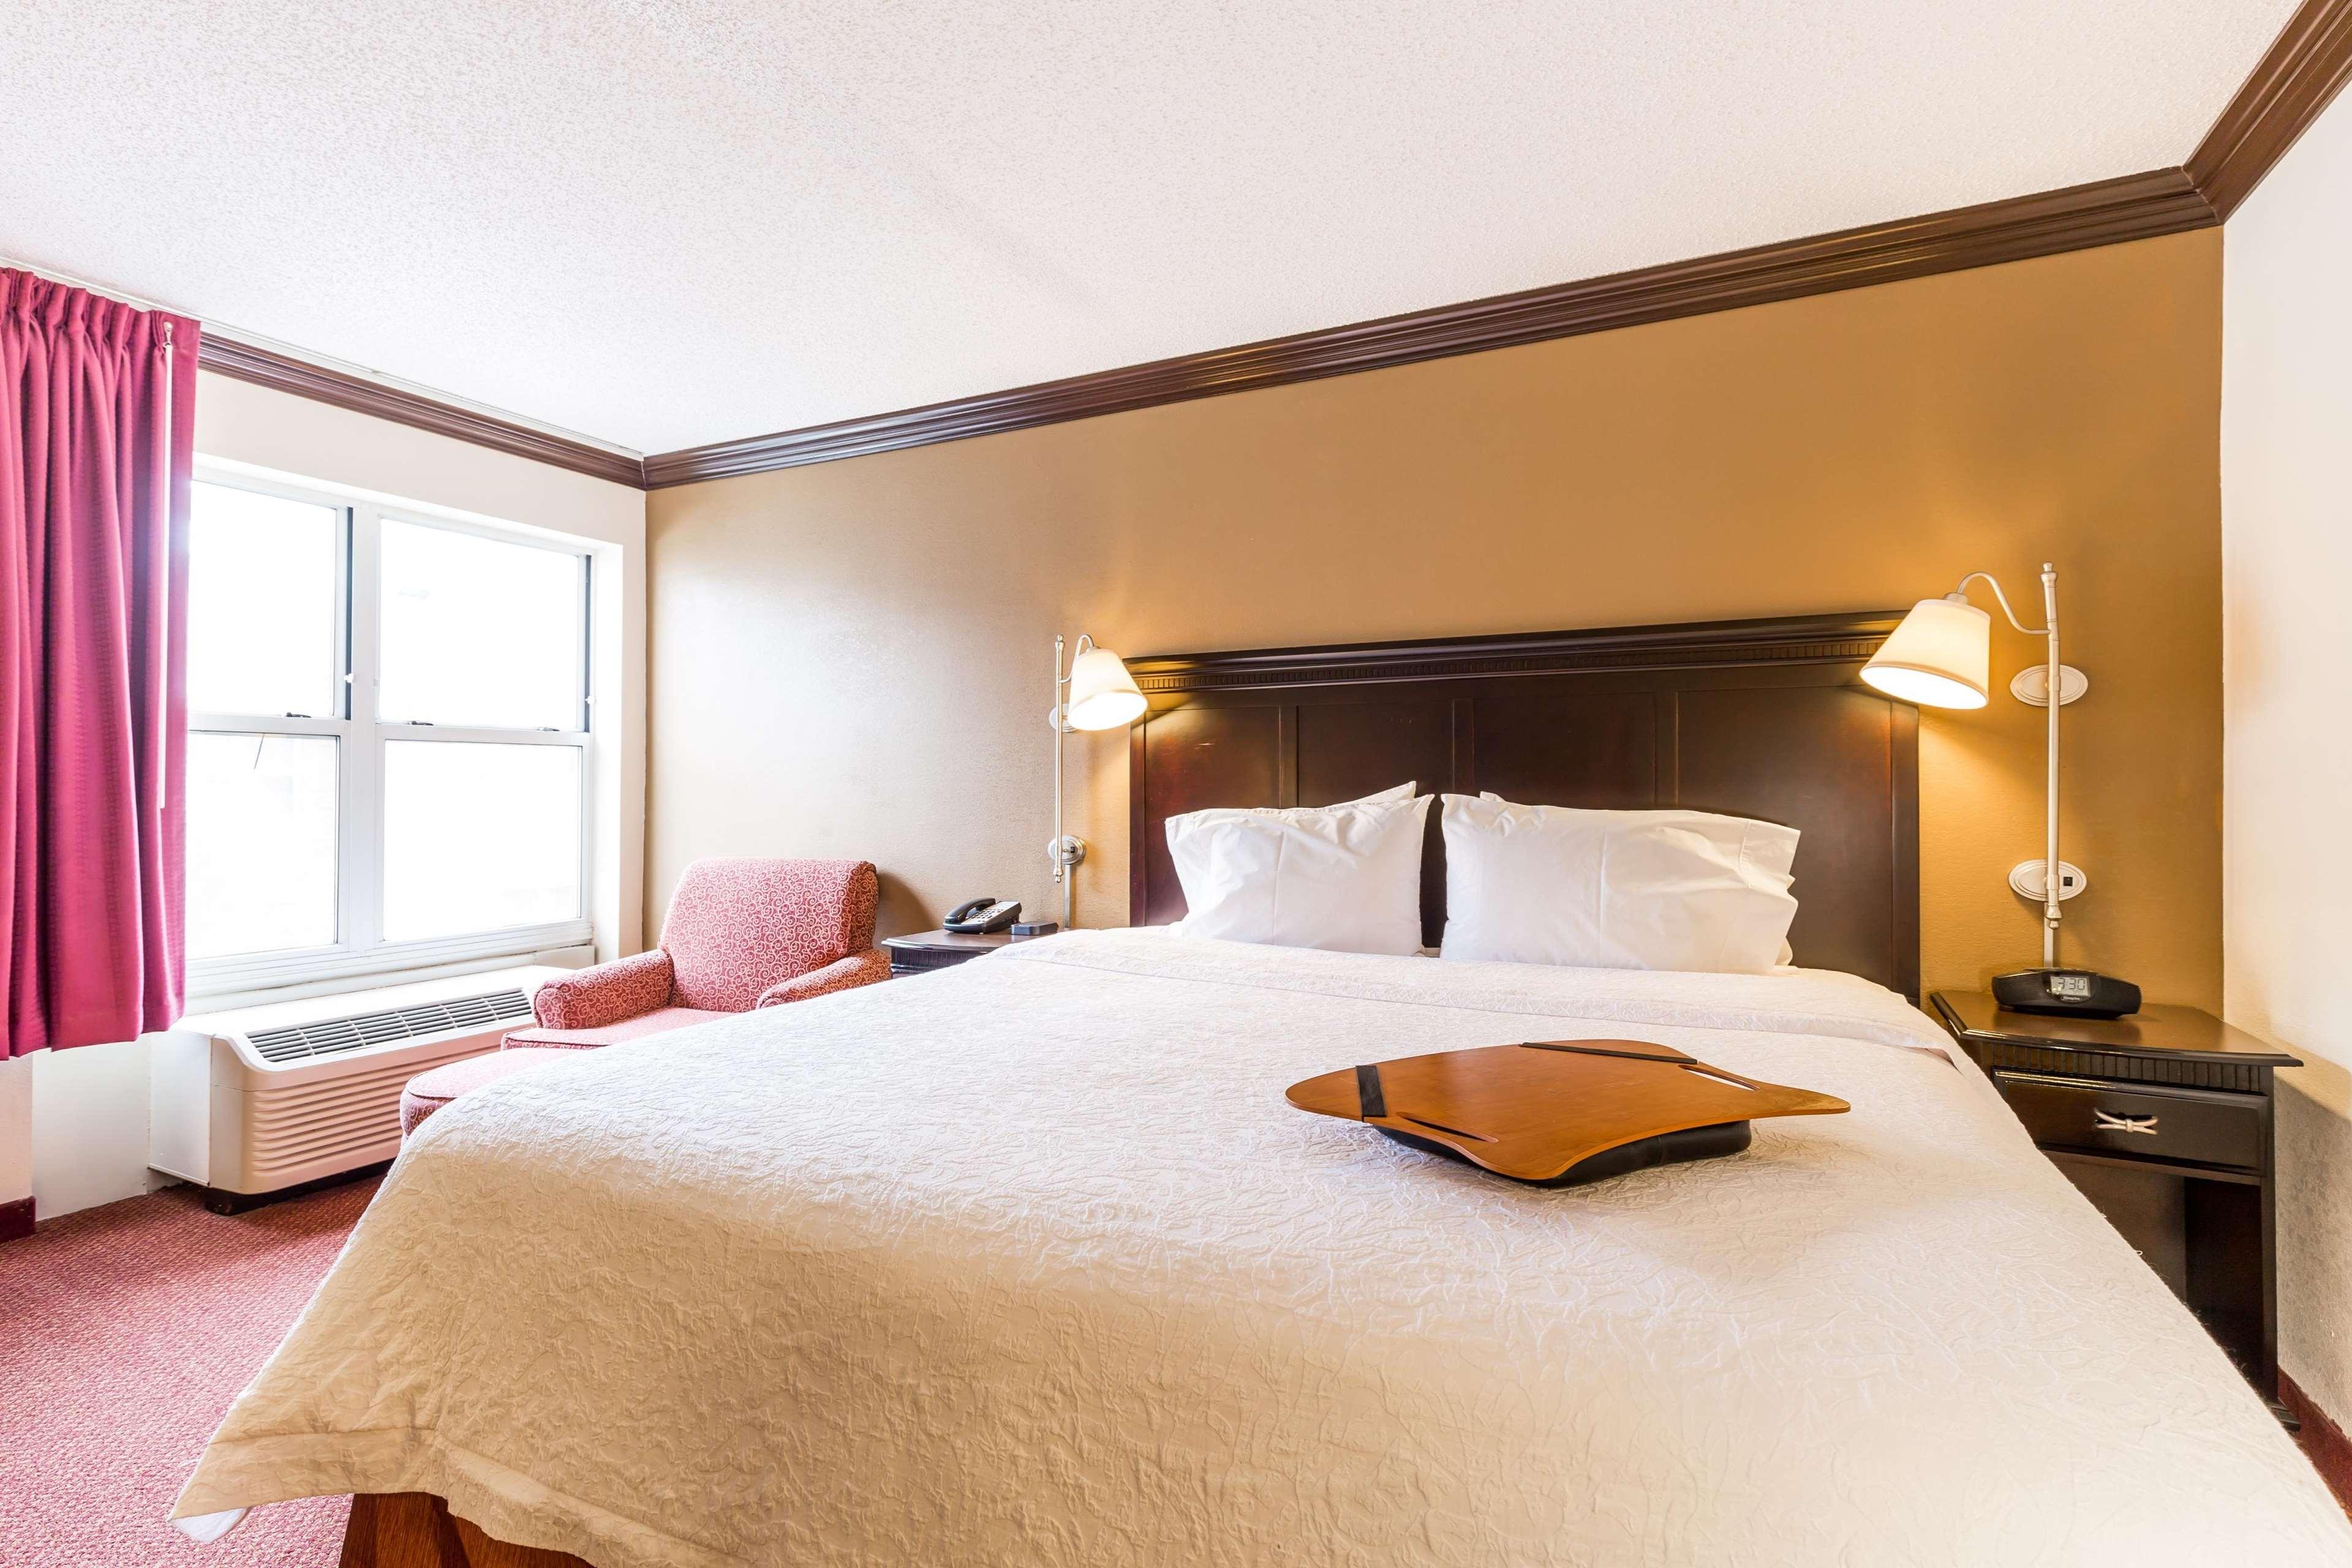 Hampton Inn & Suites Chicago/Hoffman Estates image 26